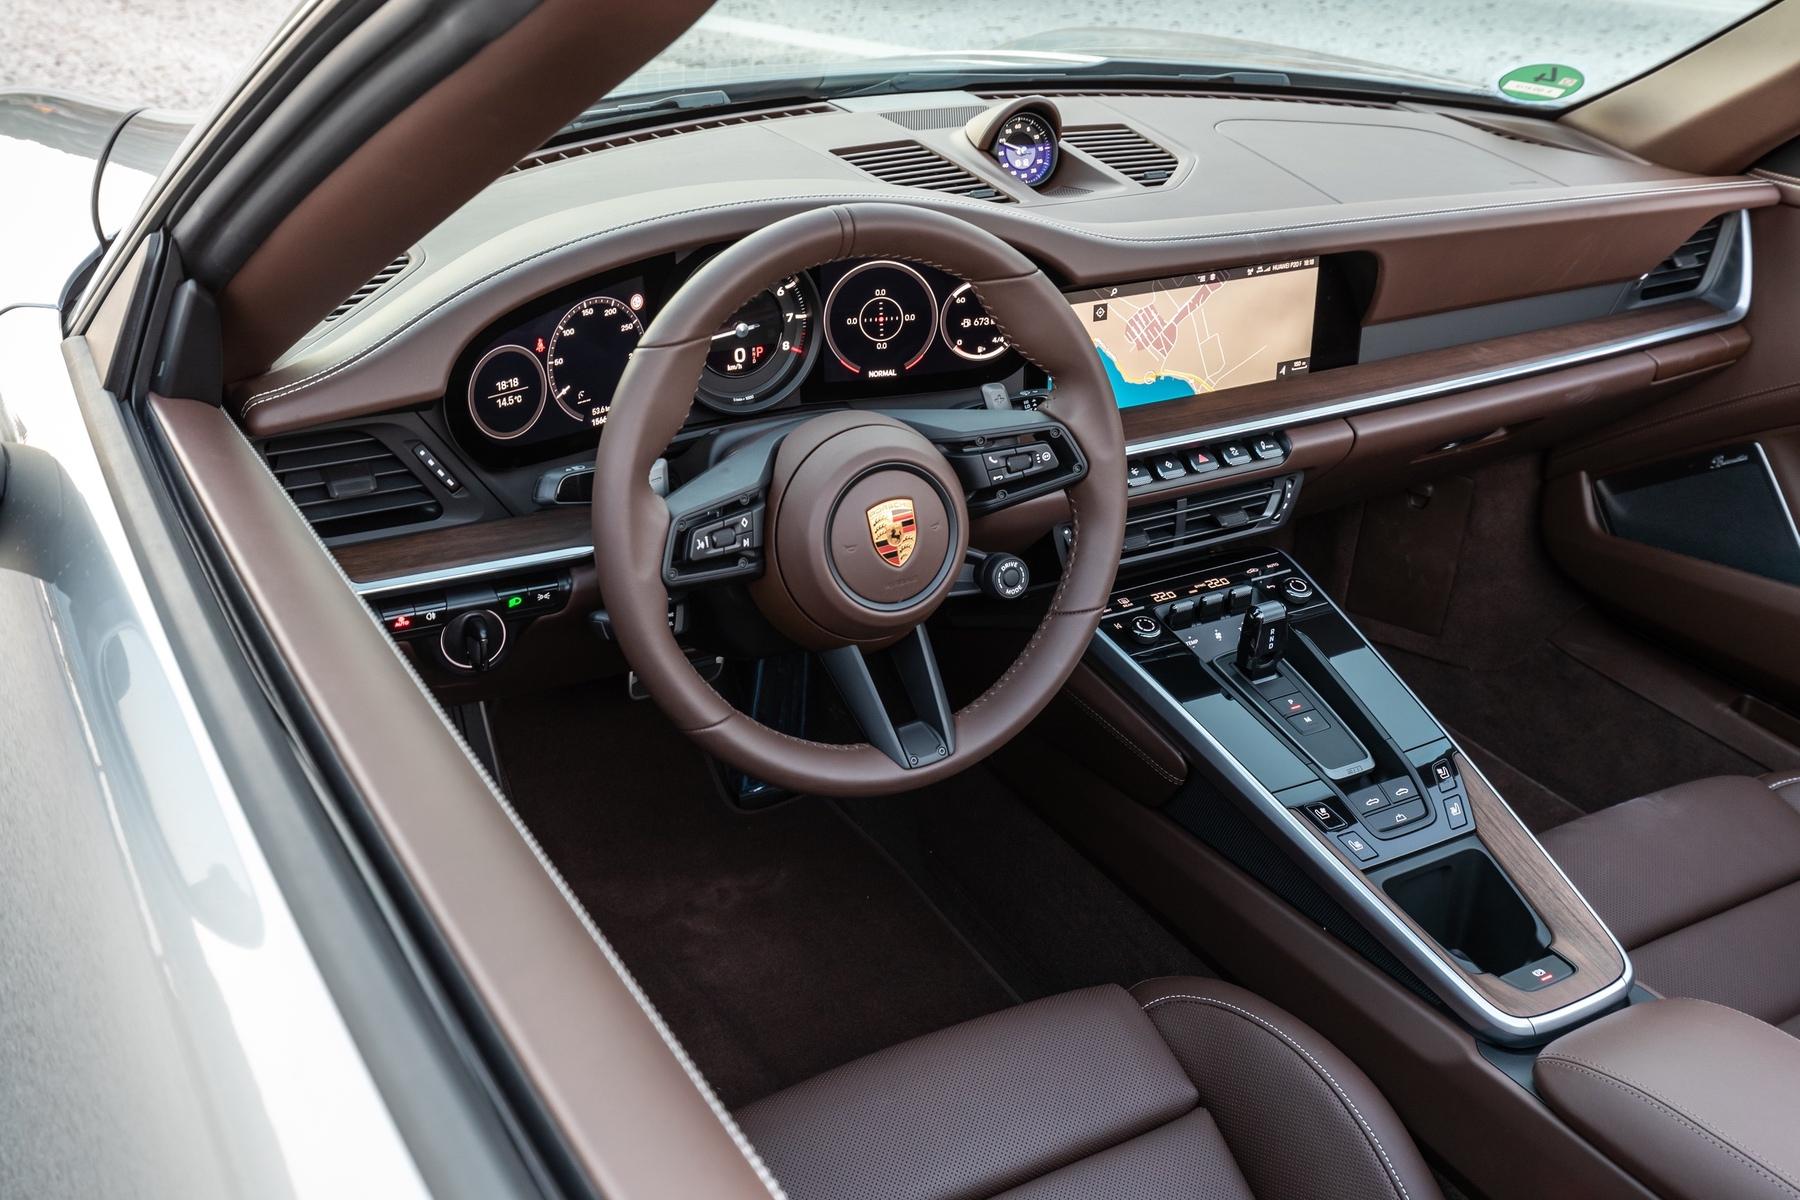 Test_Drive_Porsche_911_Athens_0208